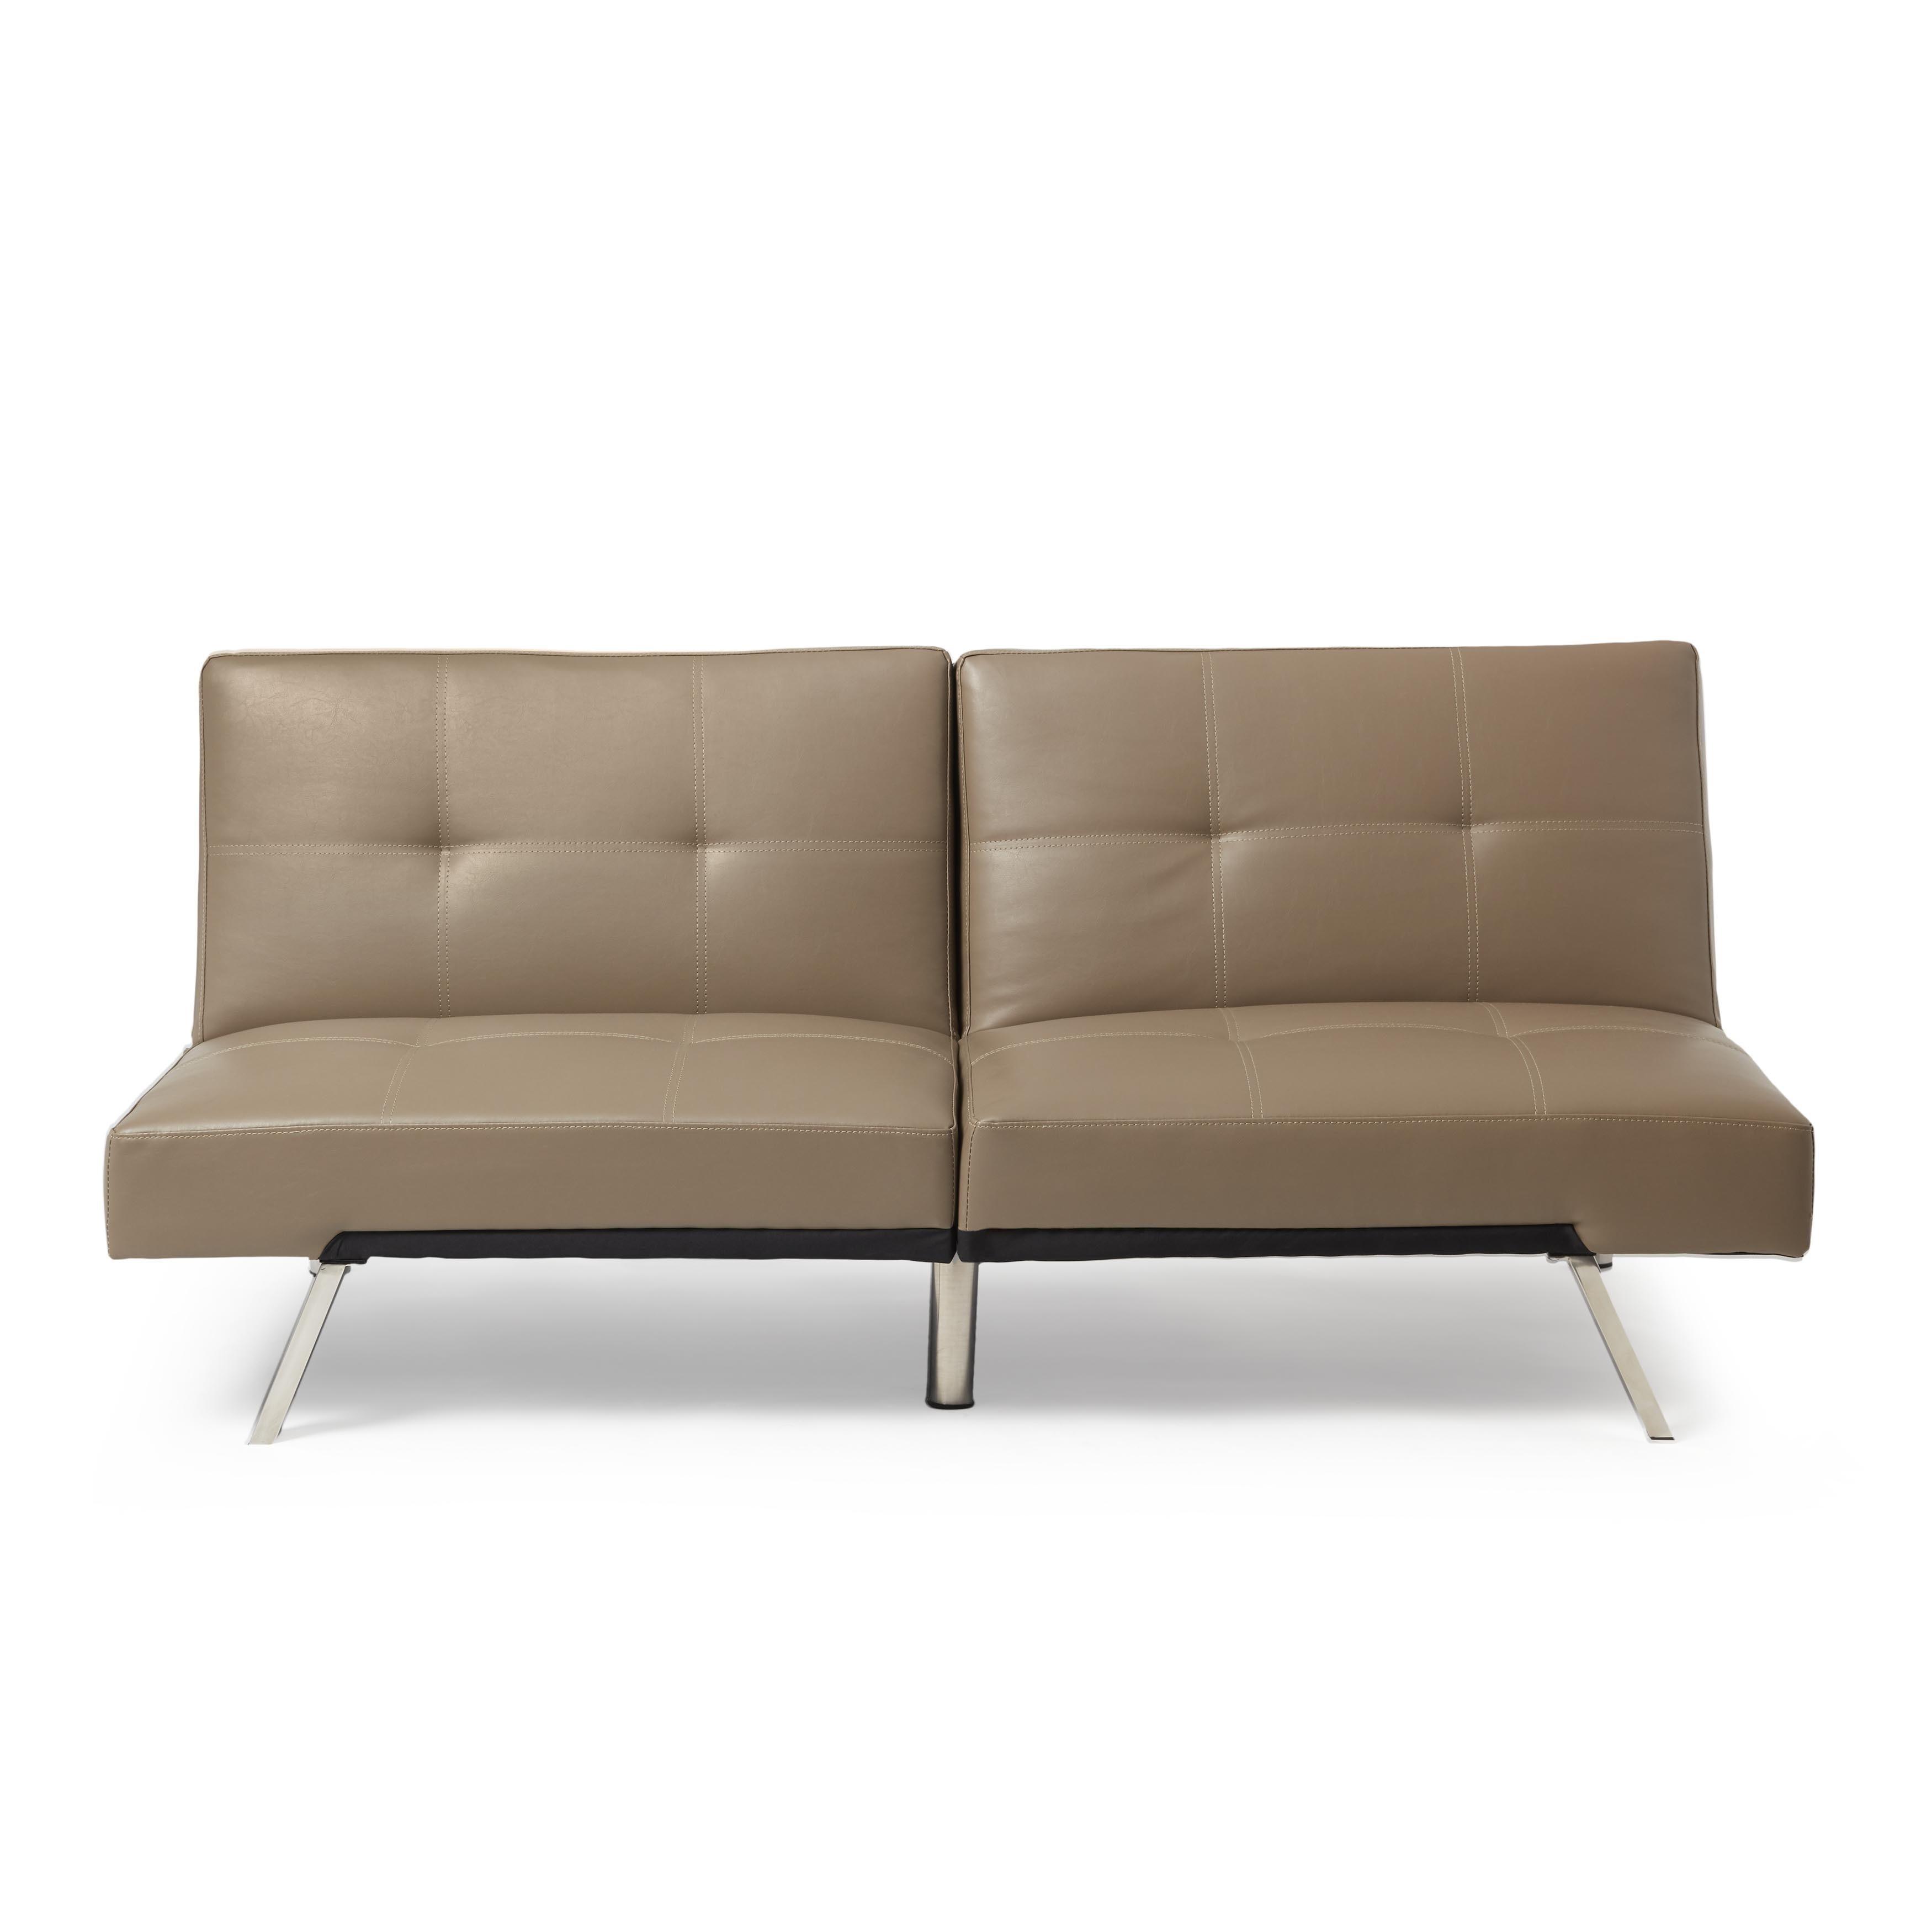 Abbyson Aspen Taupe Bonded Leather Foldable Futon Sleeper Sofa On Free Shipping Today Com 9043835